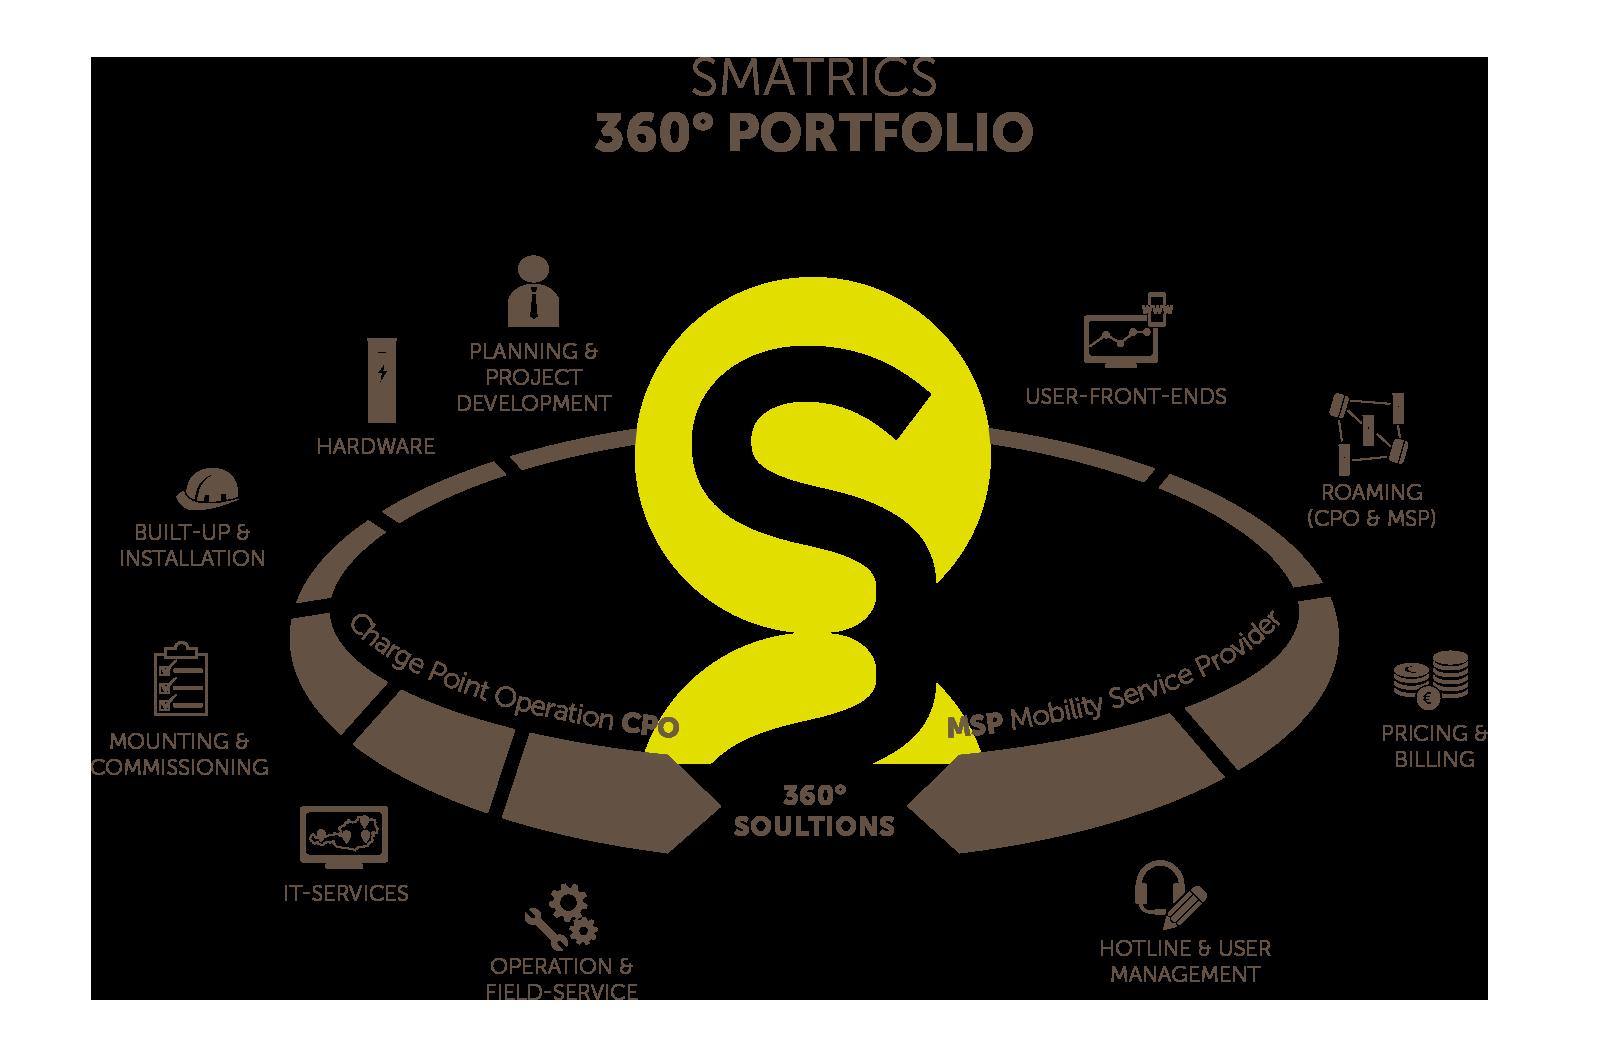 smatrics 360 degree portfolio